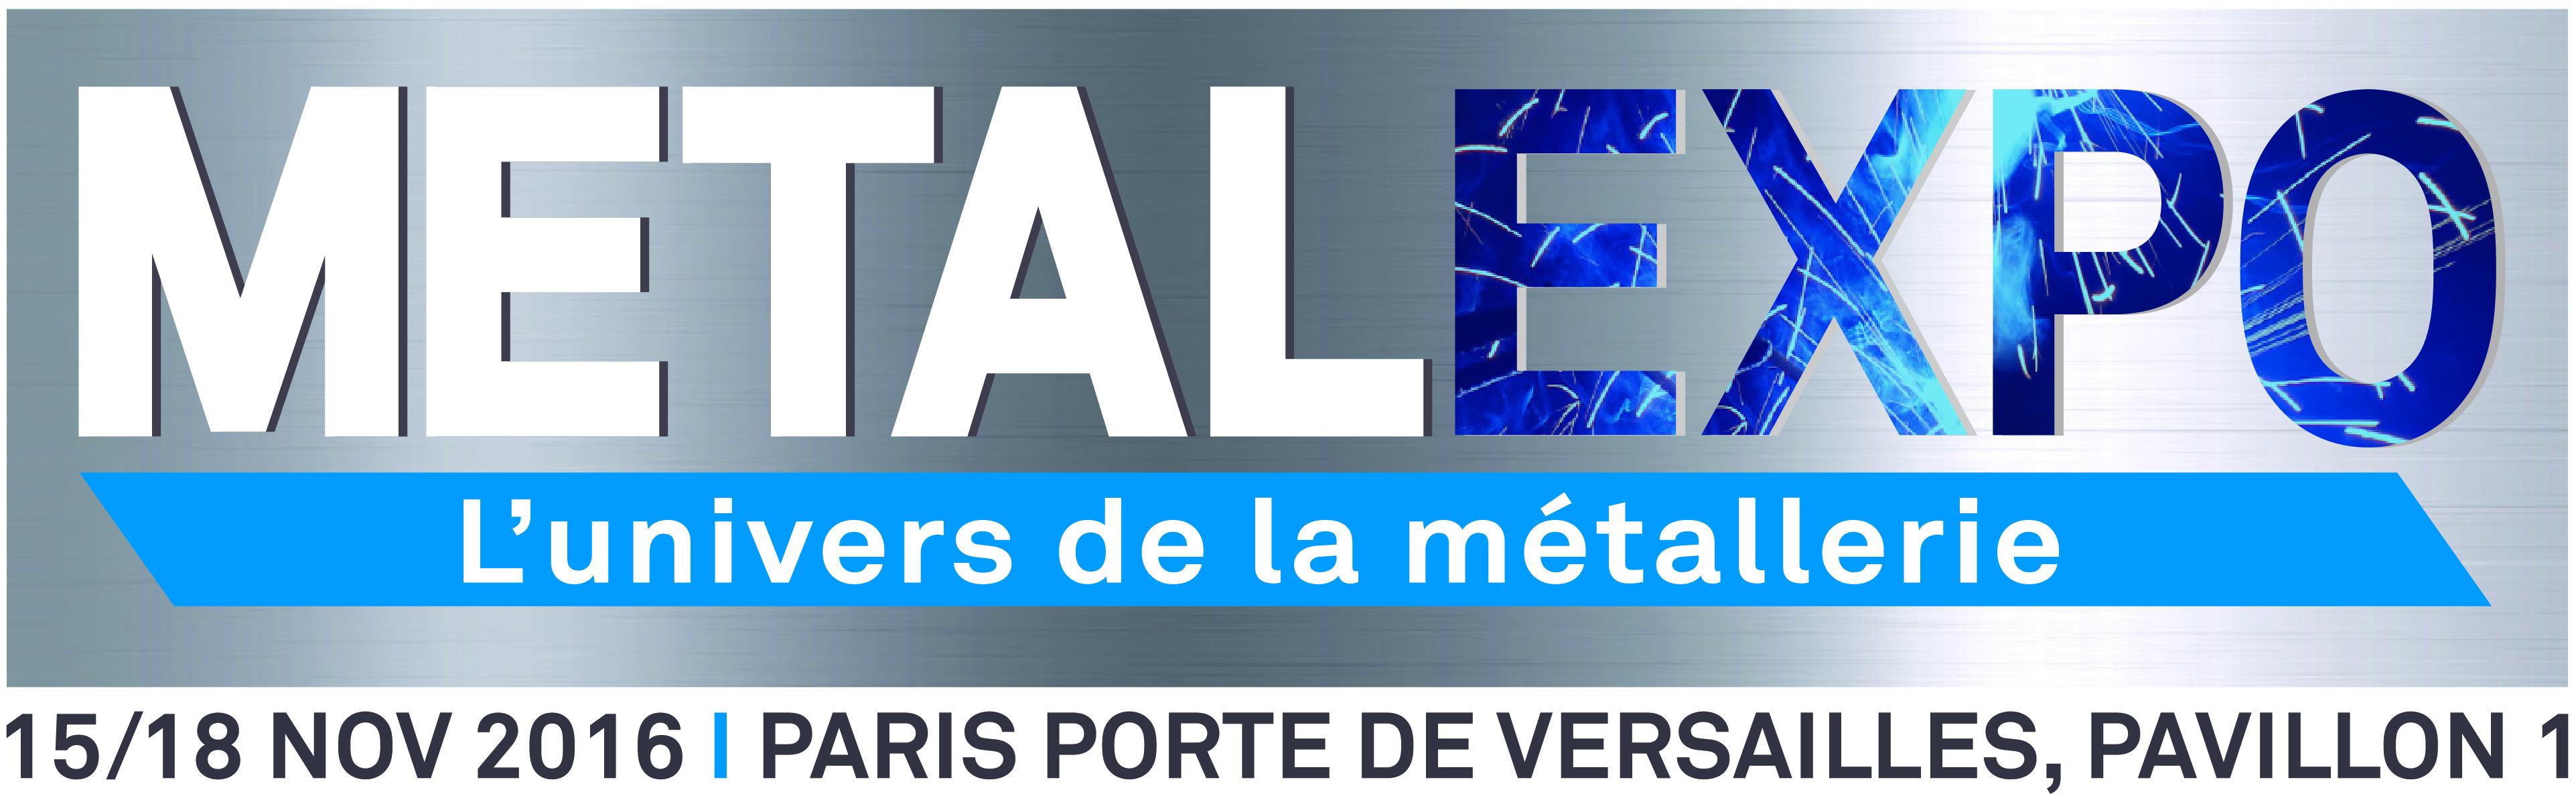 Metalexpo paris novembre 2016 vernet behringer for Expos paris novembre 2016